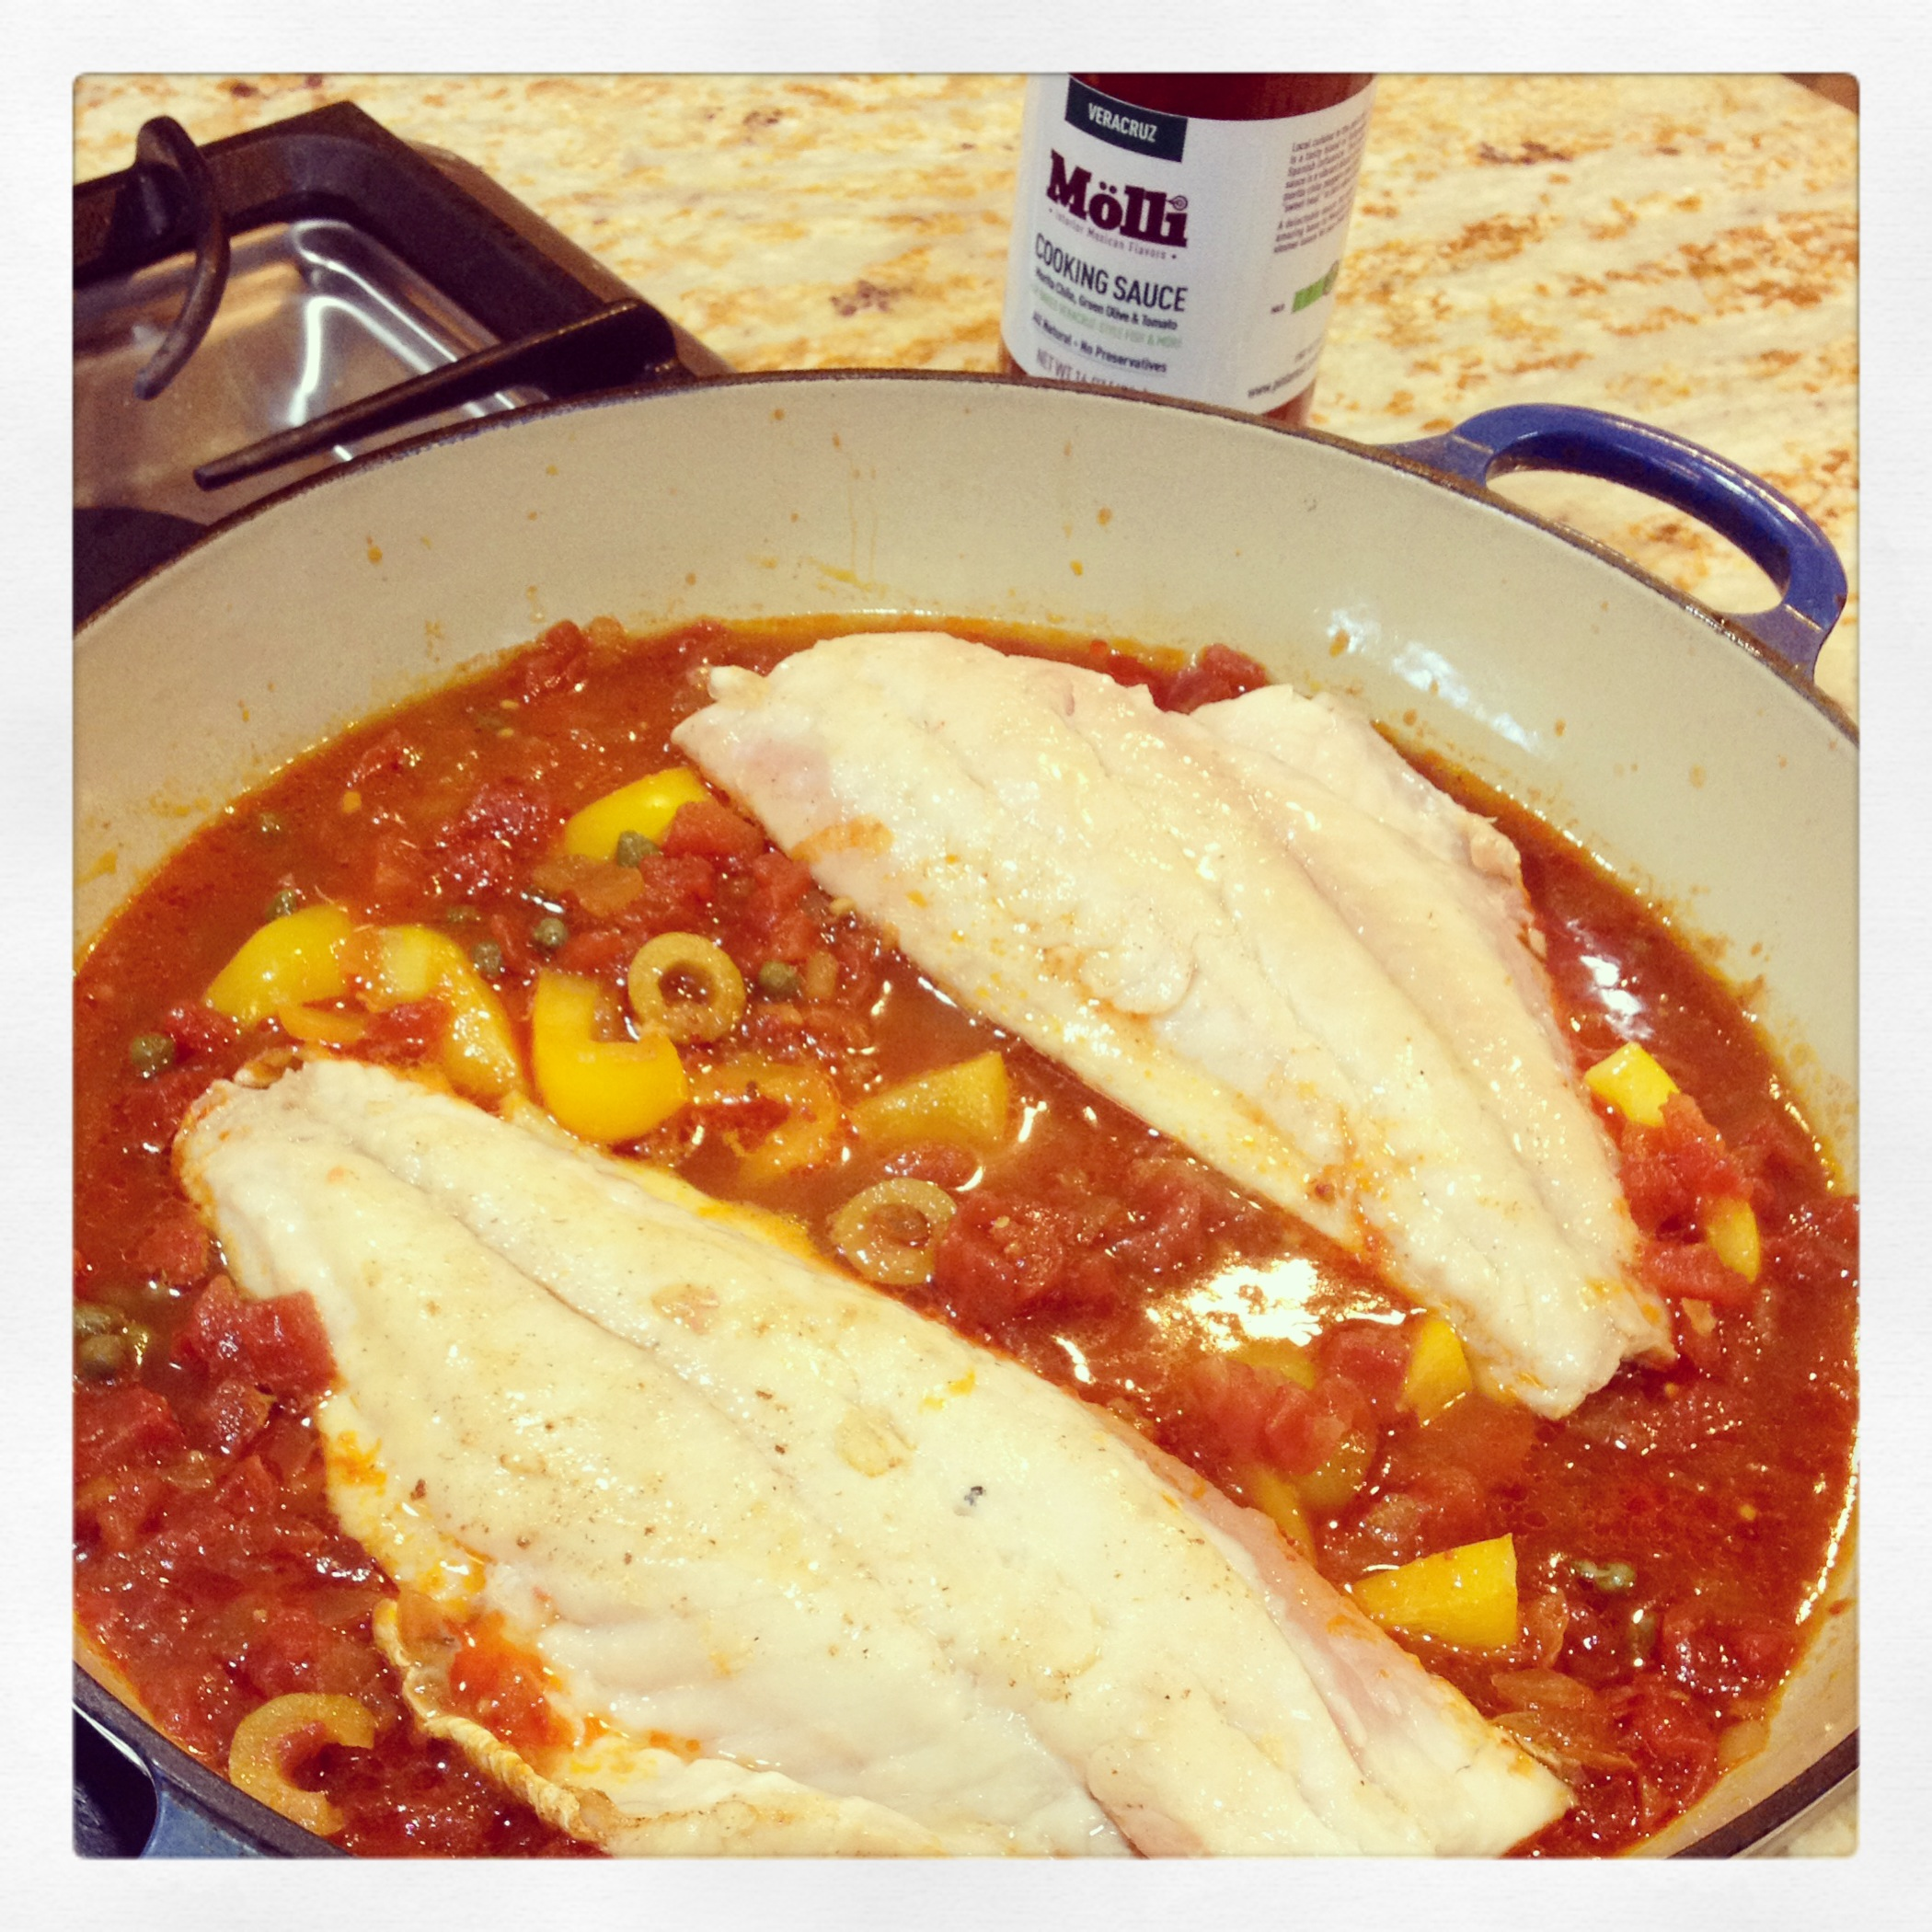 Veracruz style fish pescado a la veracruzana molli for Fish veracruz recipe